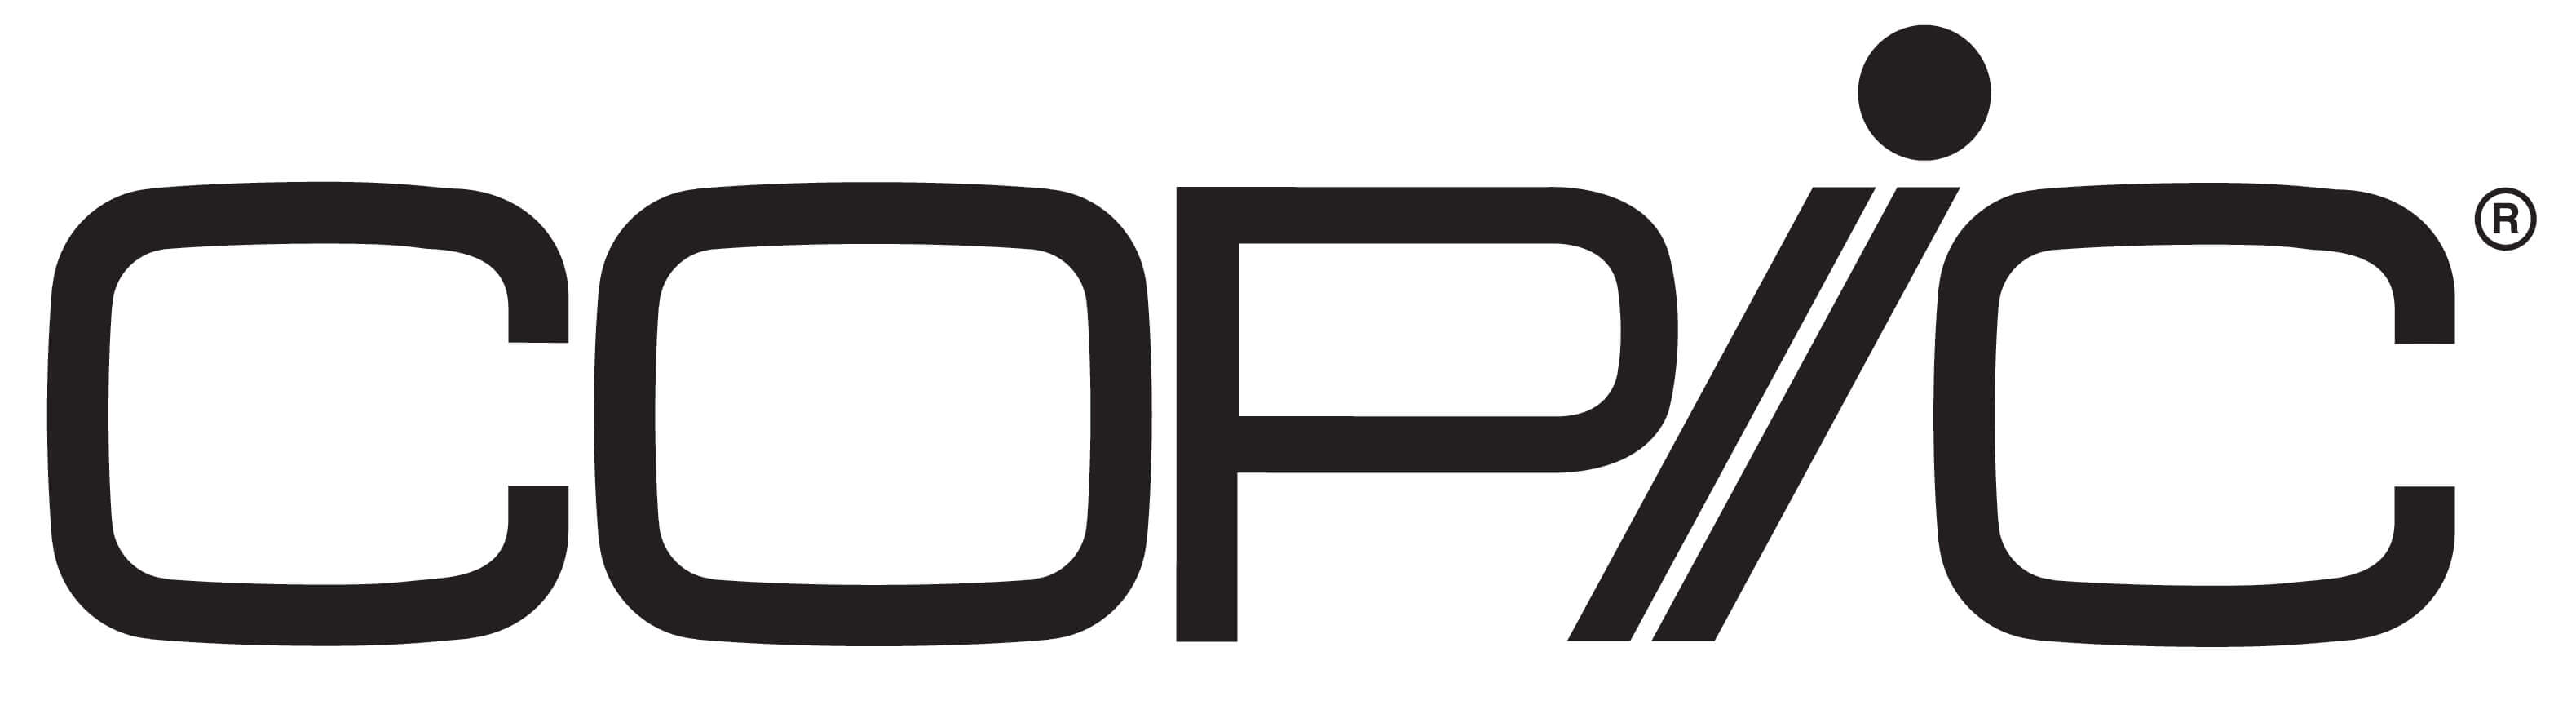 Copic Logo